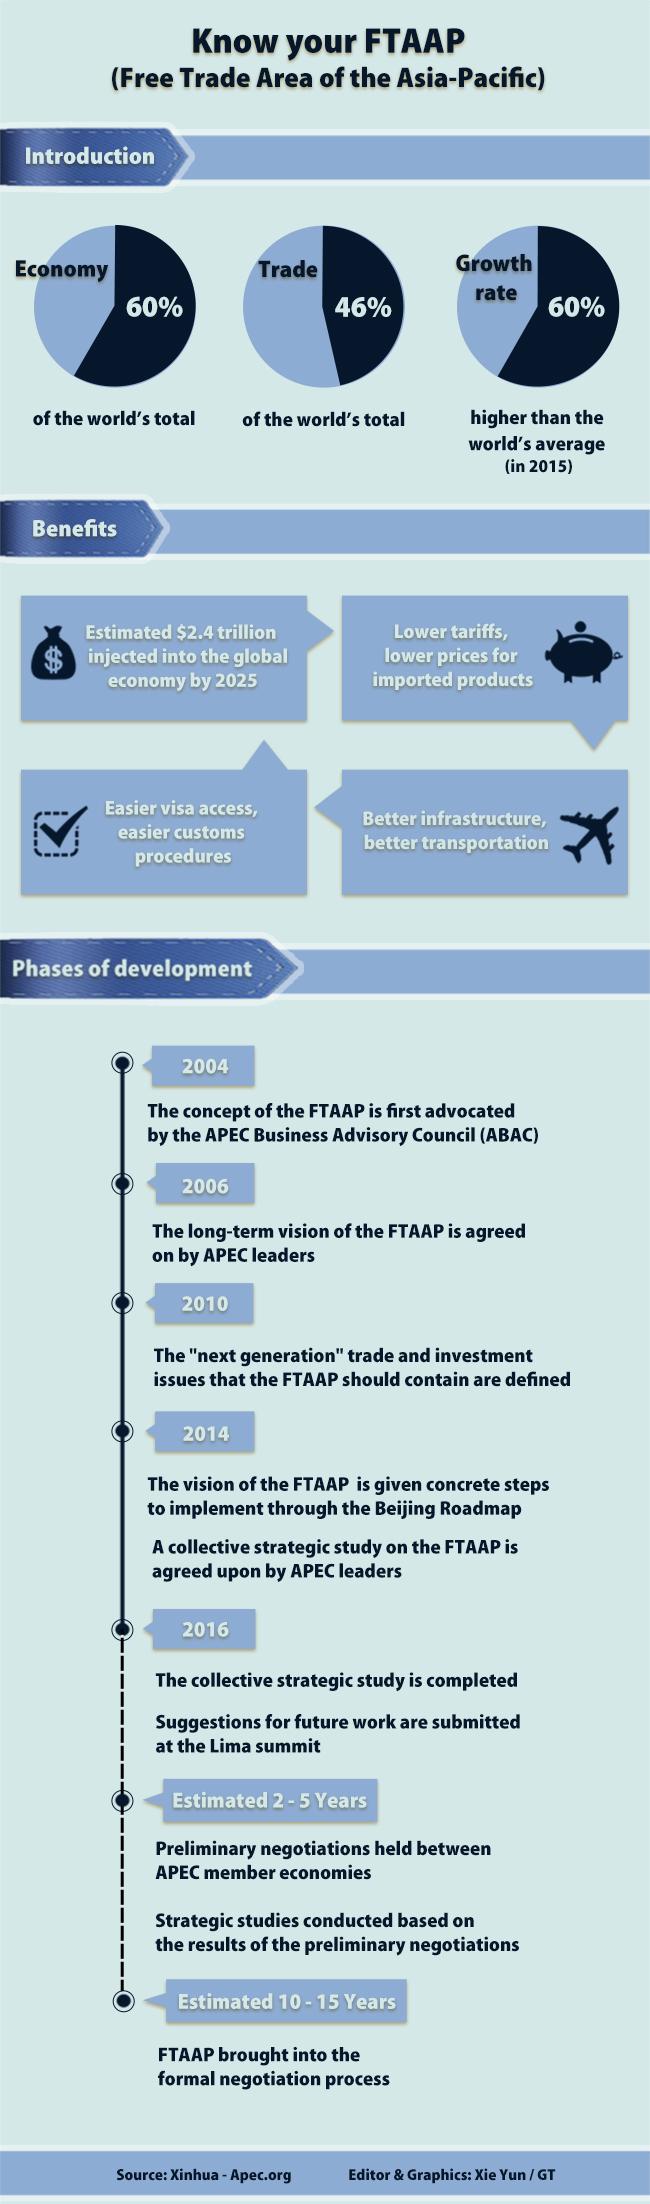 Info: FTAAP